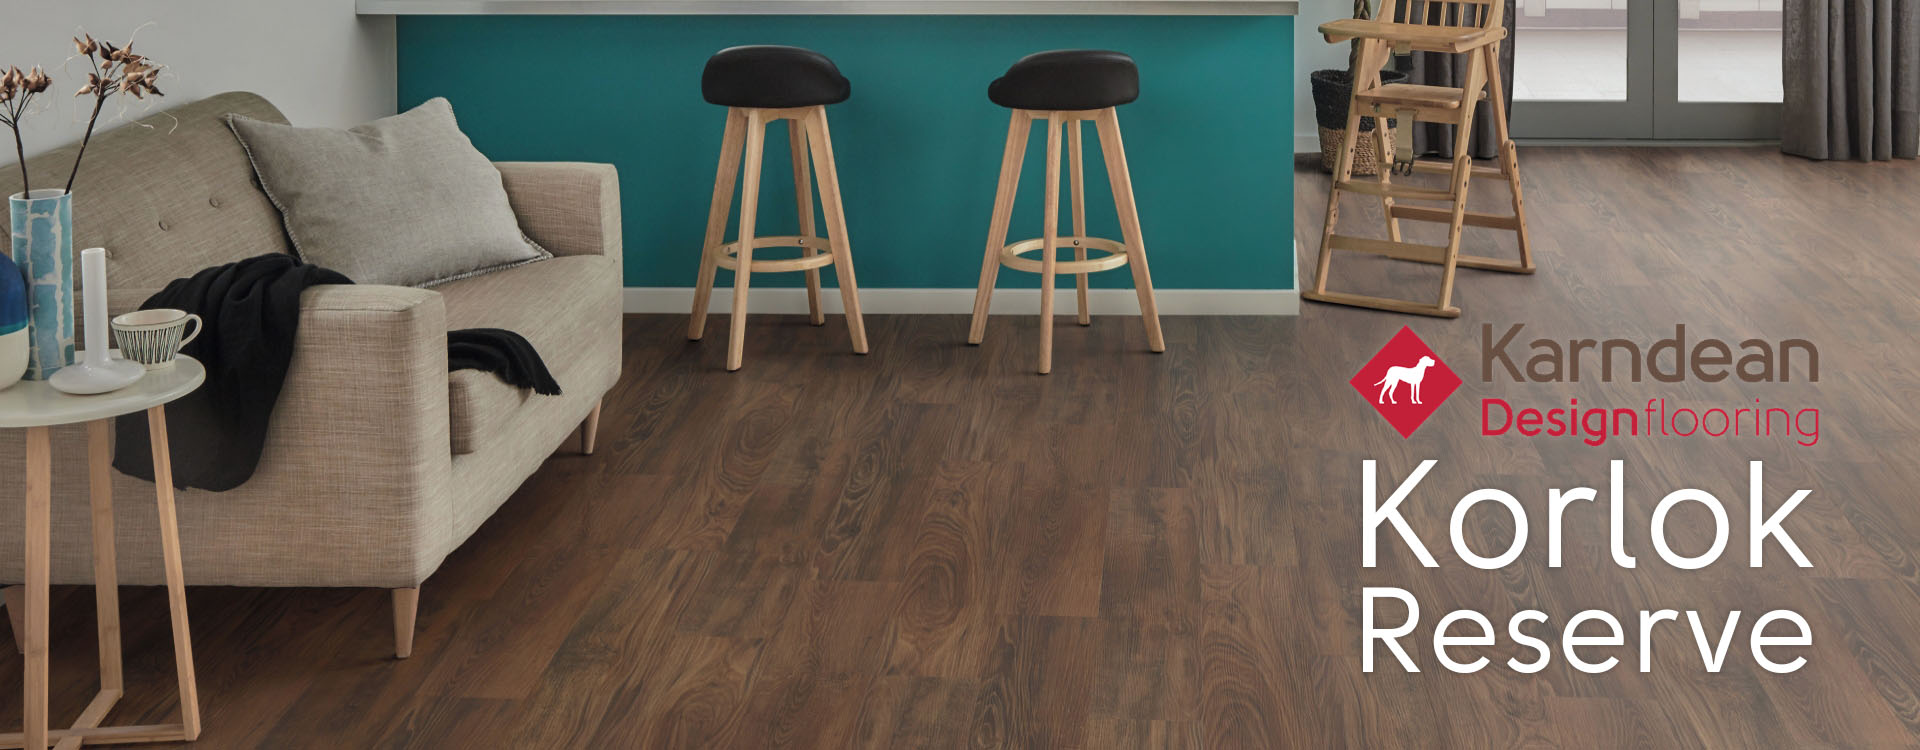 New Rigid Core flooring from Karndean Flooring; Korlok Reserve. Everything clicks with Korlok.